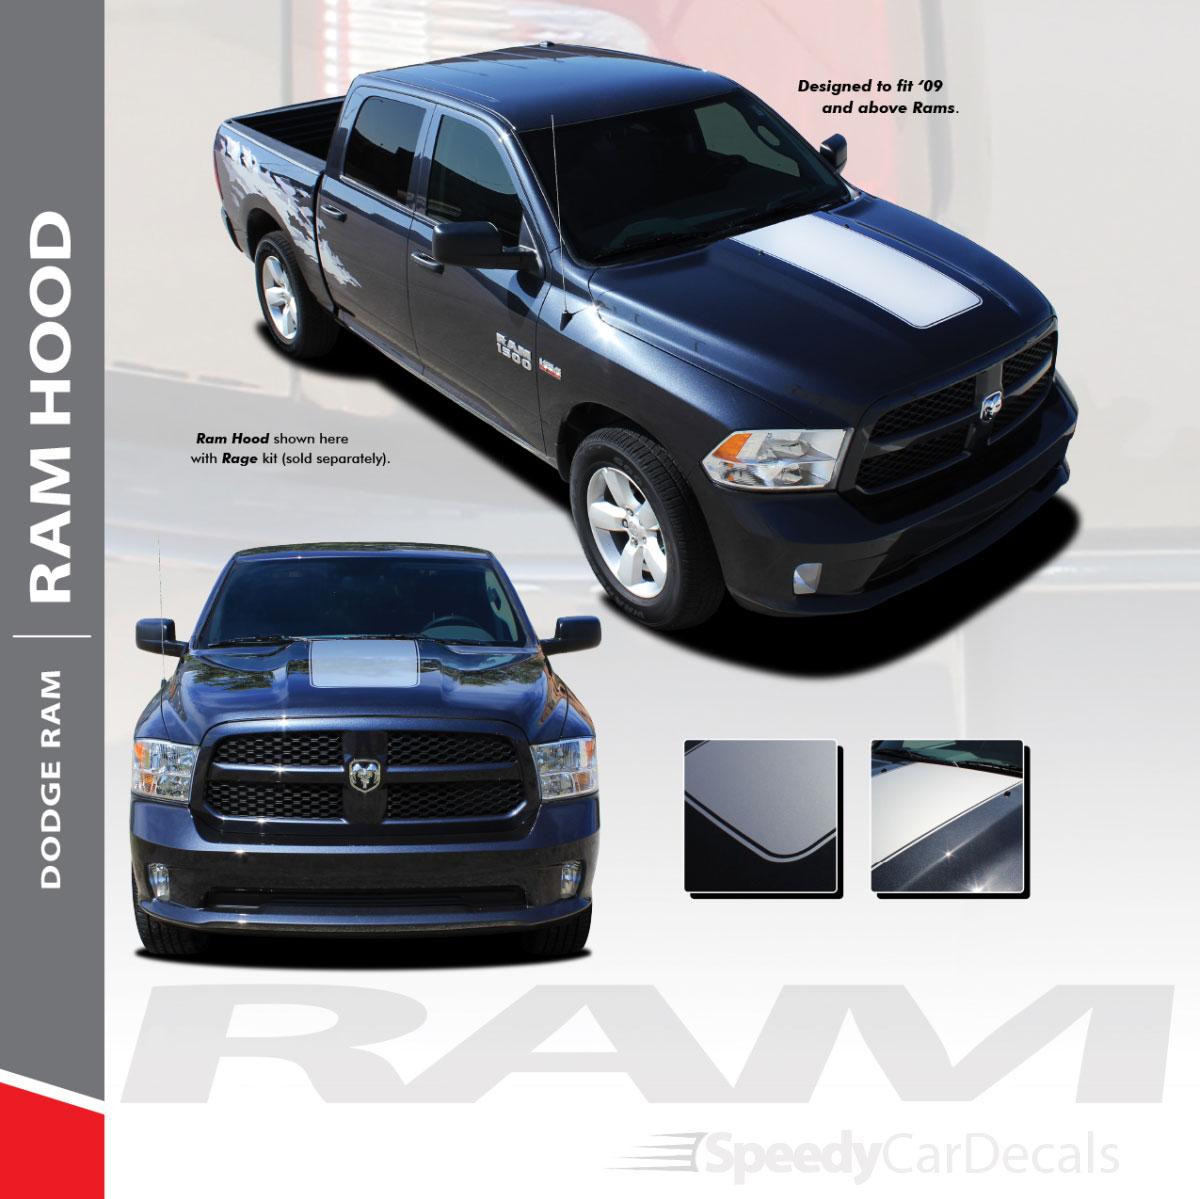 Center Dodge 1500 Ram Hood Stripes 2009 2018 2019 2021 Ram Classic